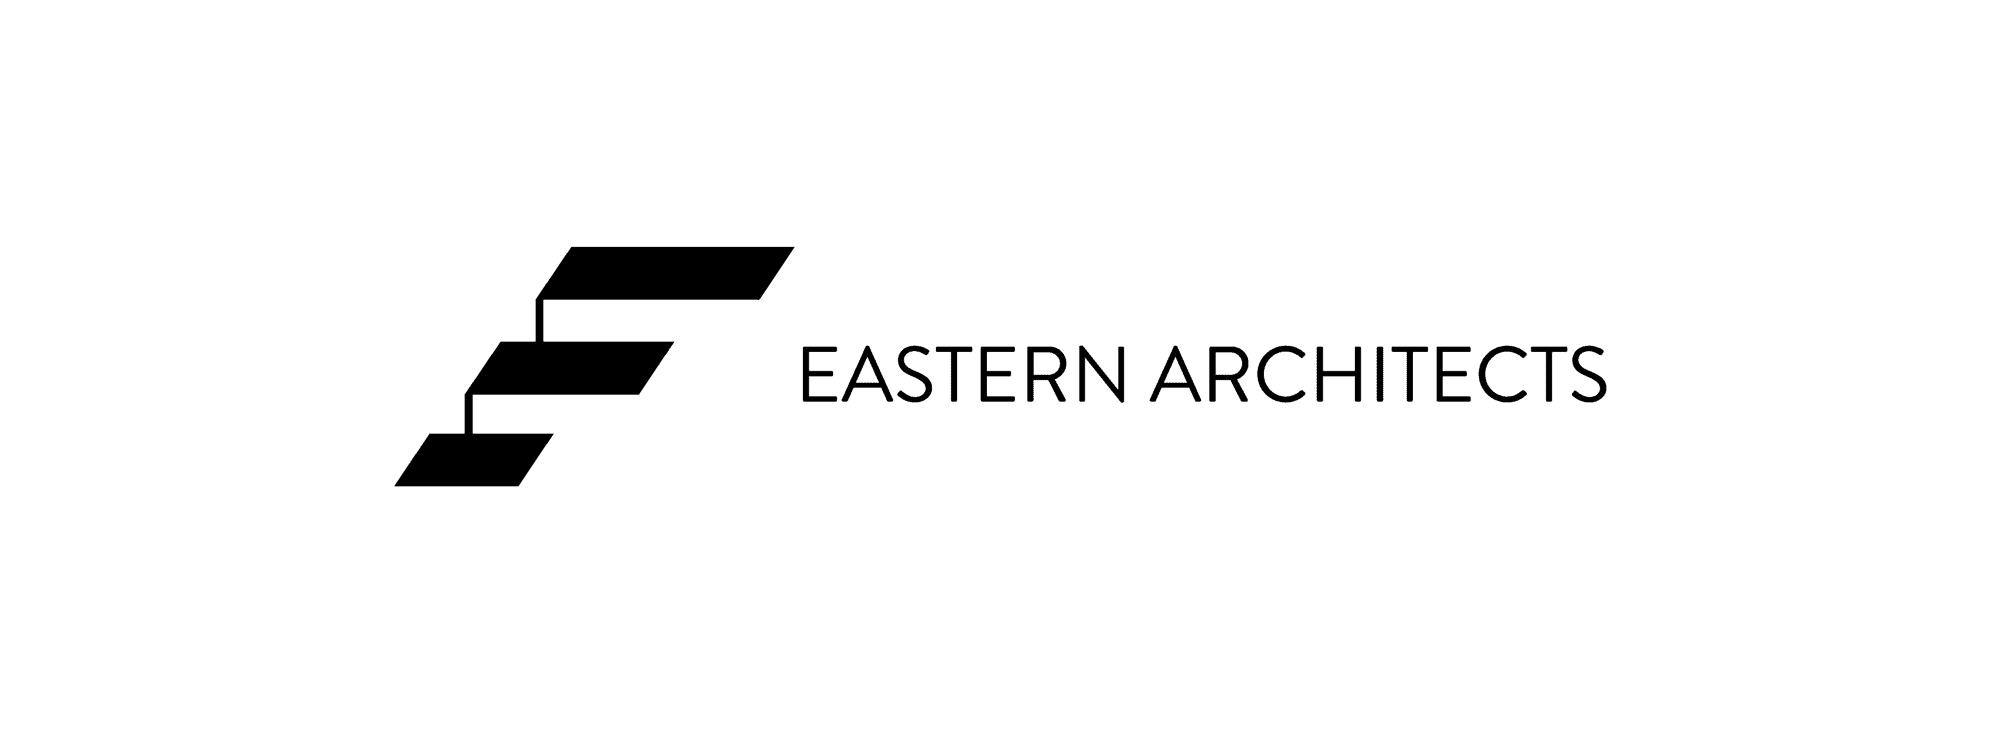 eastern architects dallas branding design